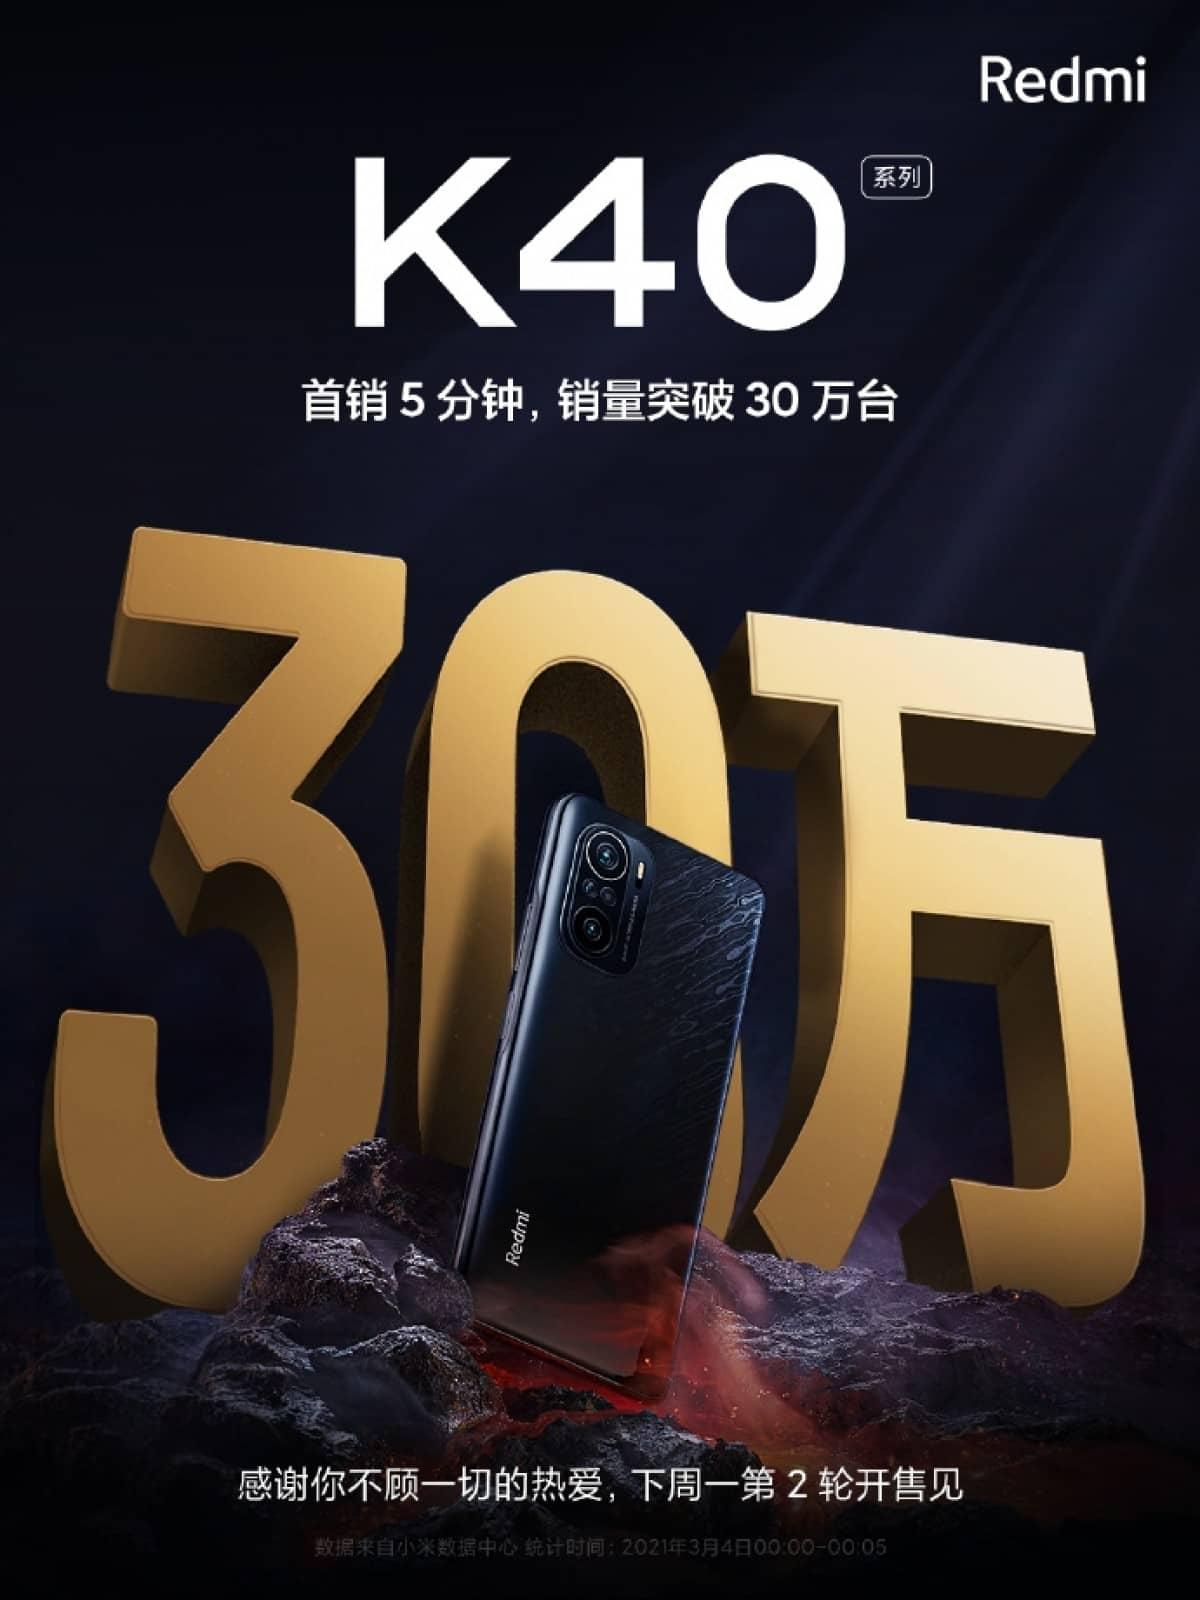 Xiaomi Redmi K40 Pro vendas na china